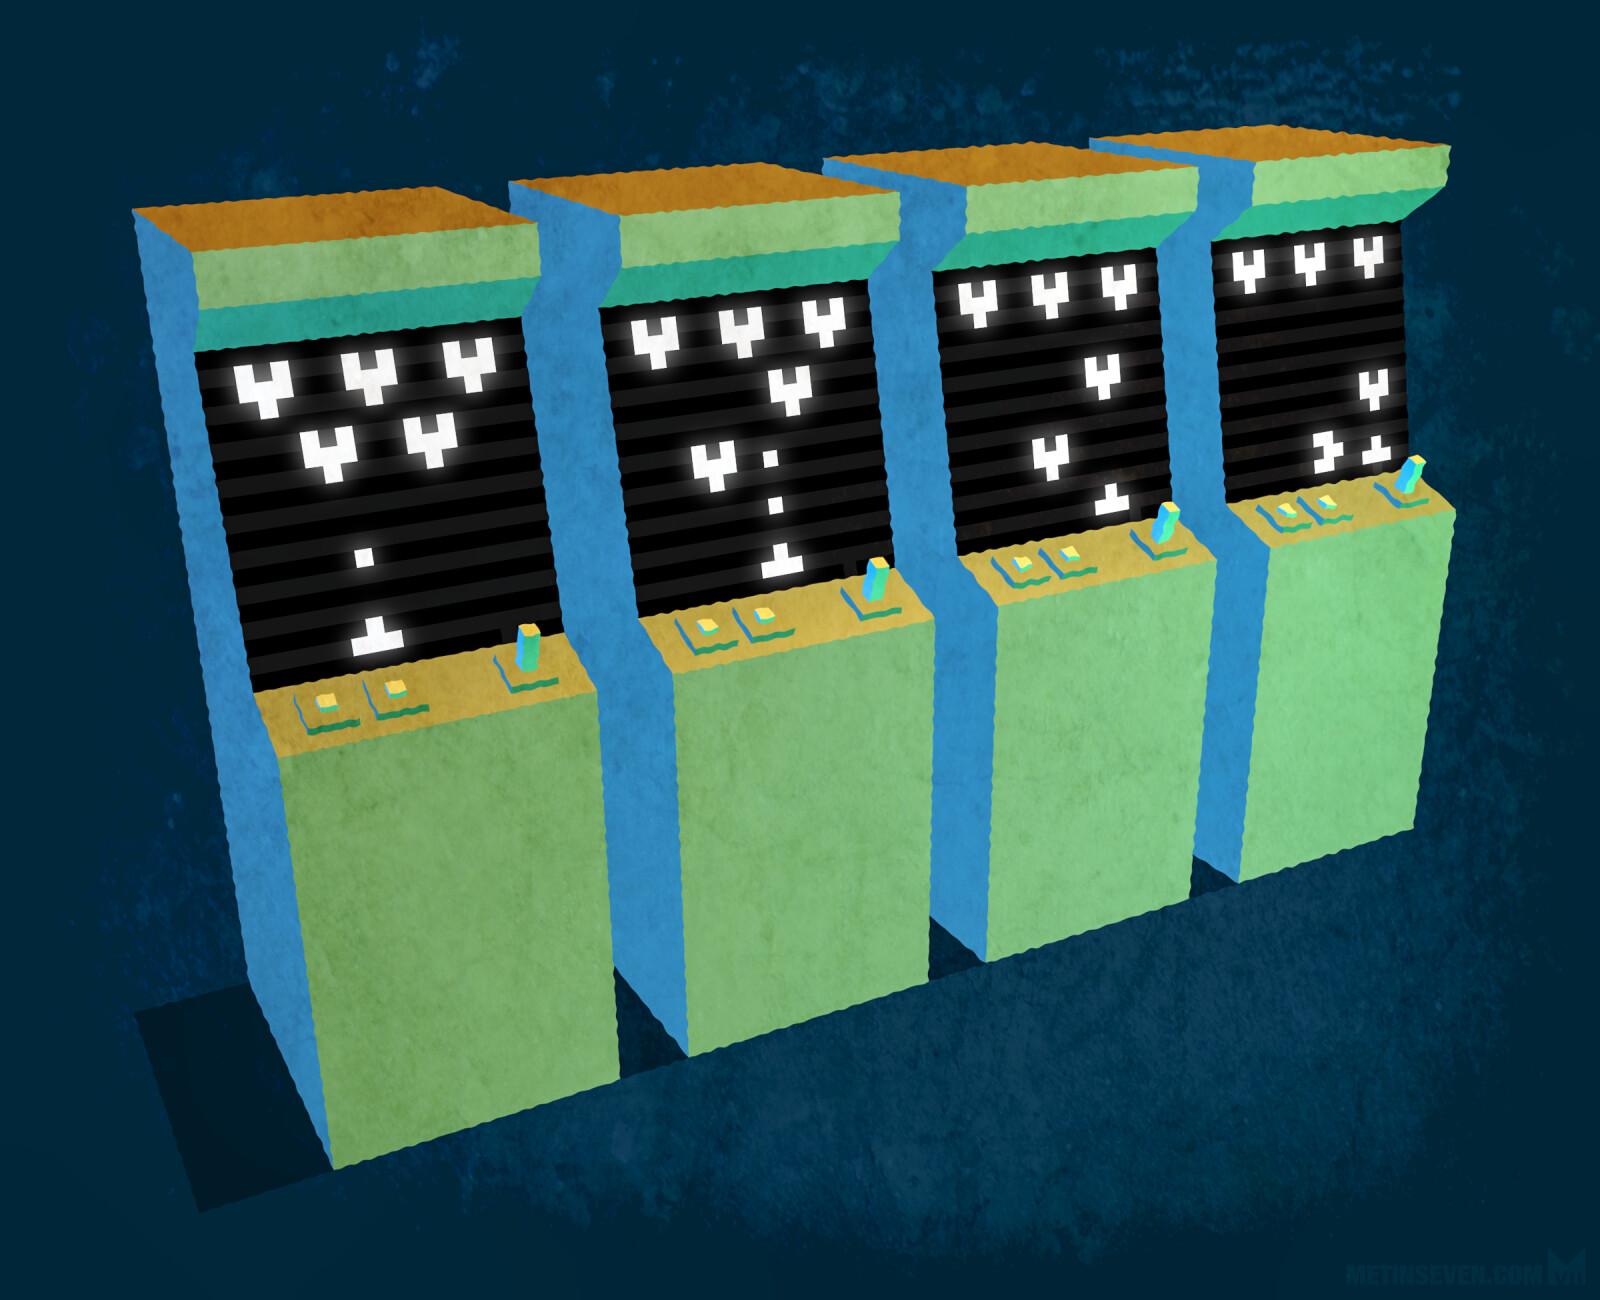 Arcade memories